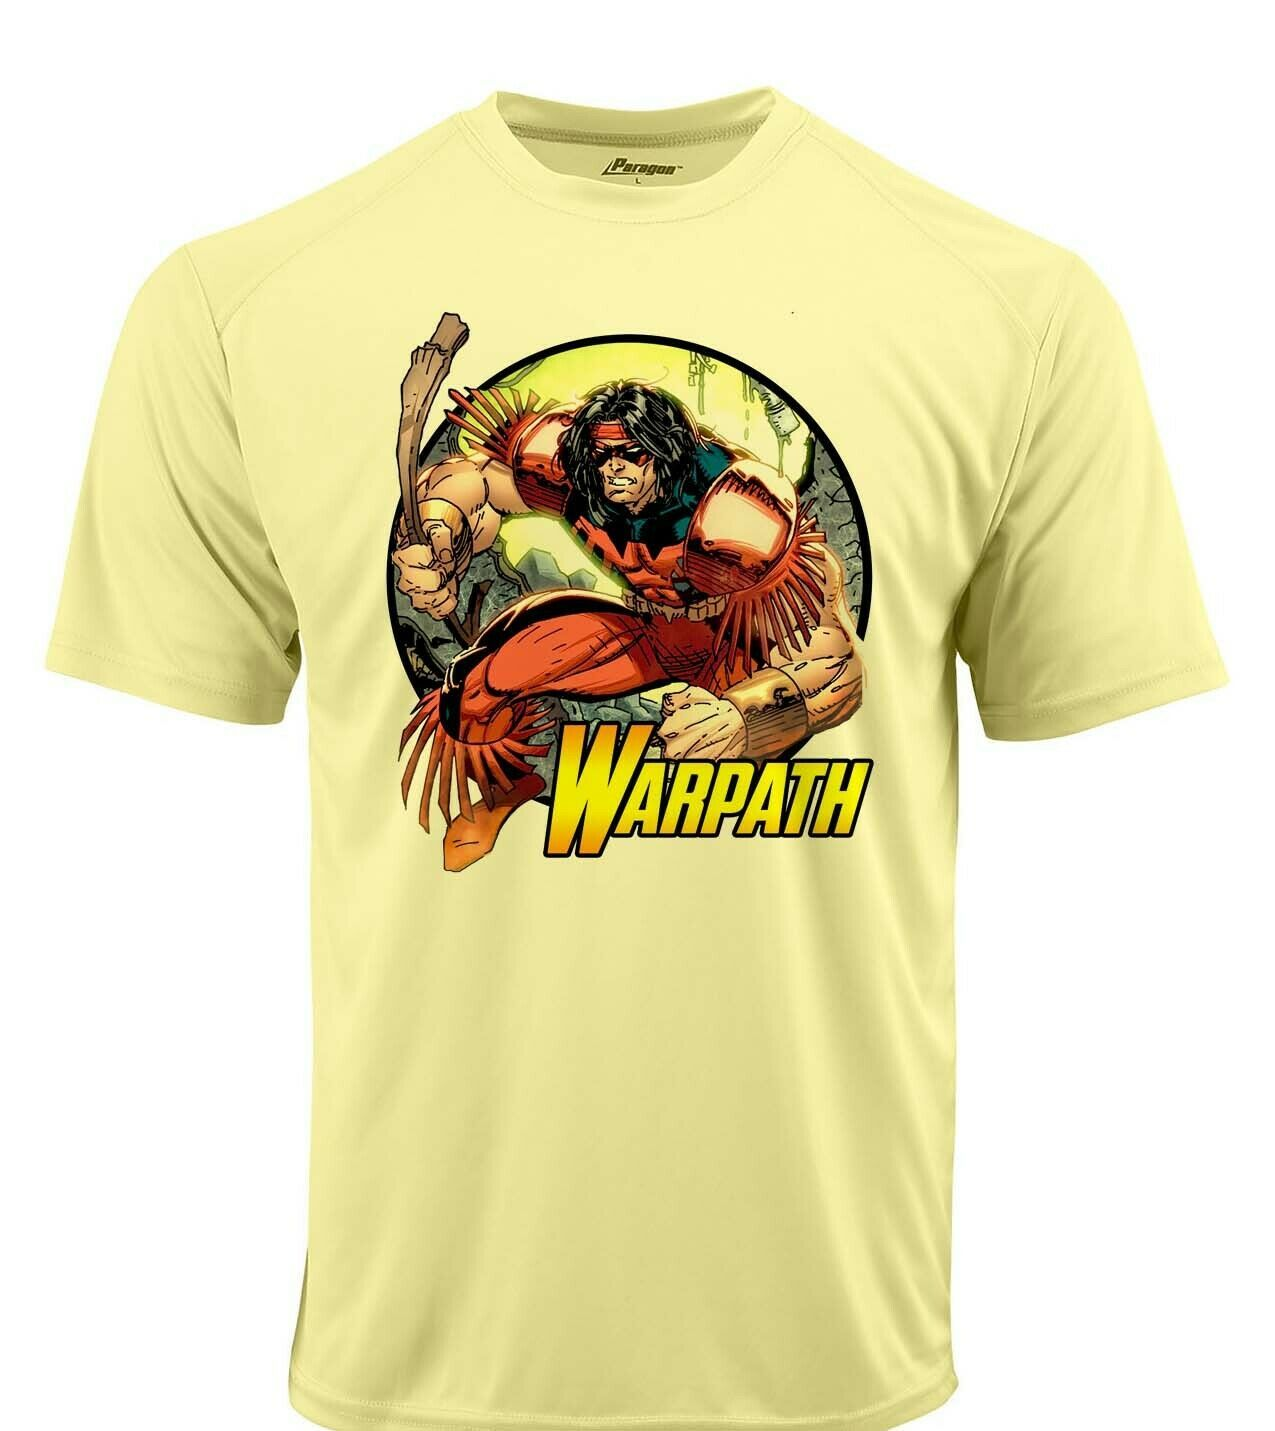 Warpath dri fit graphic tshirt moisture wicking superhero comic book spf tee 2